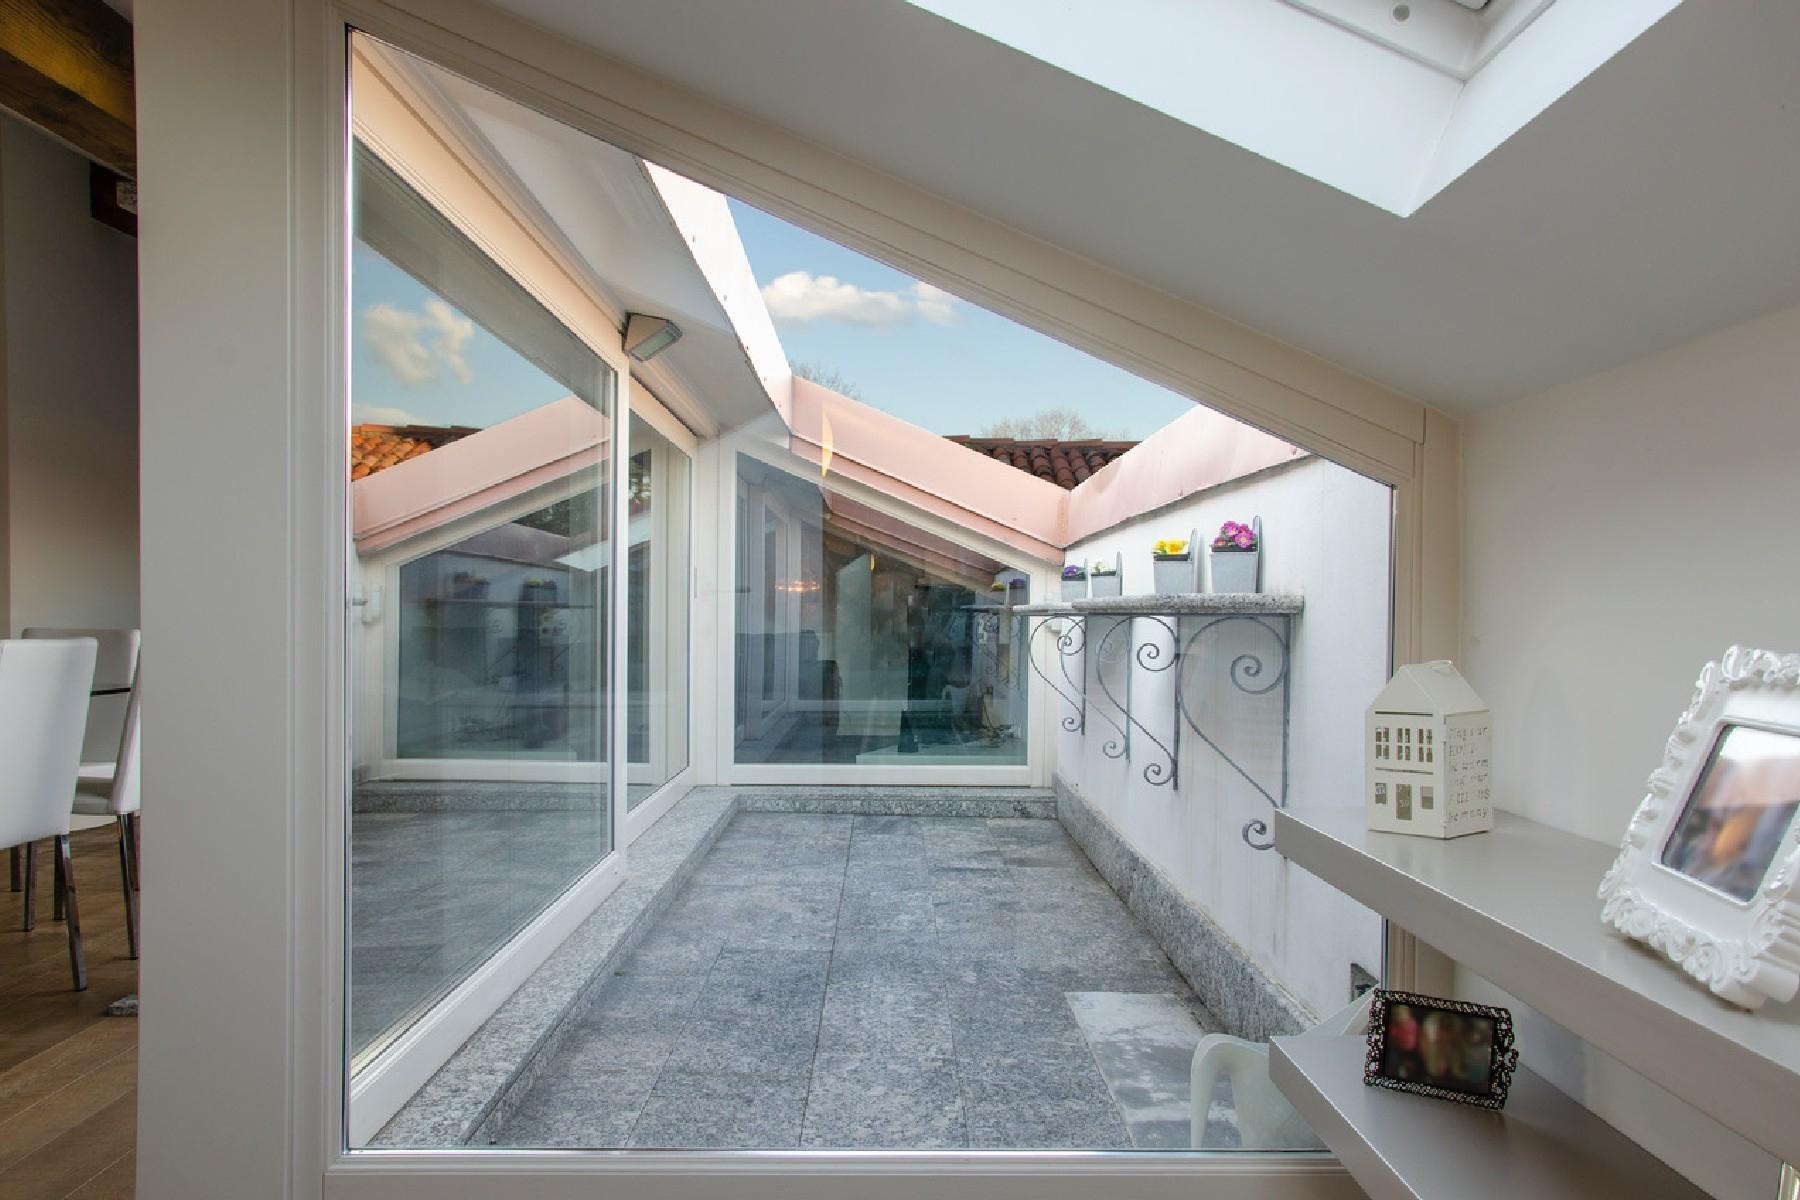 Appartamento in Vendita a Merate: 4 locali, 225 mq - Foto 23